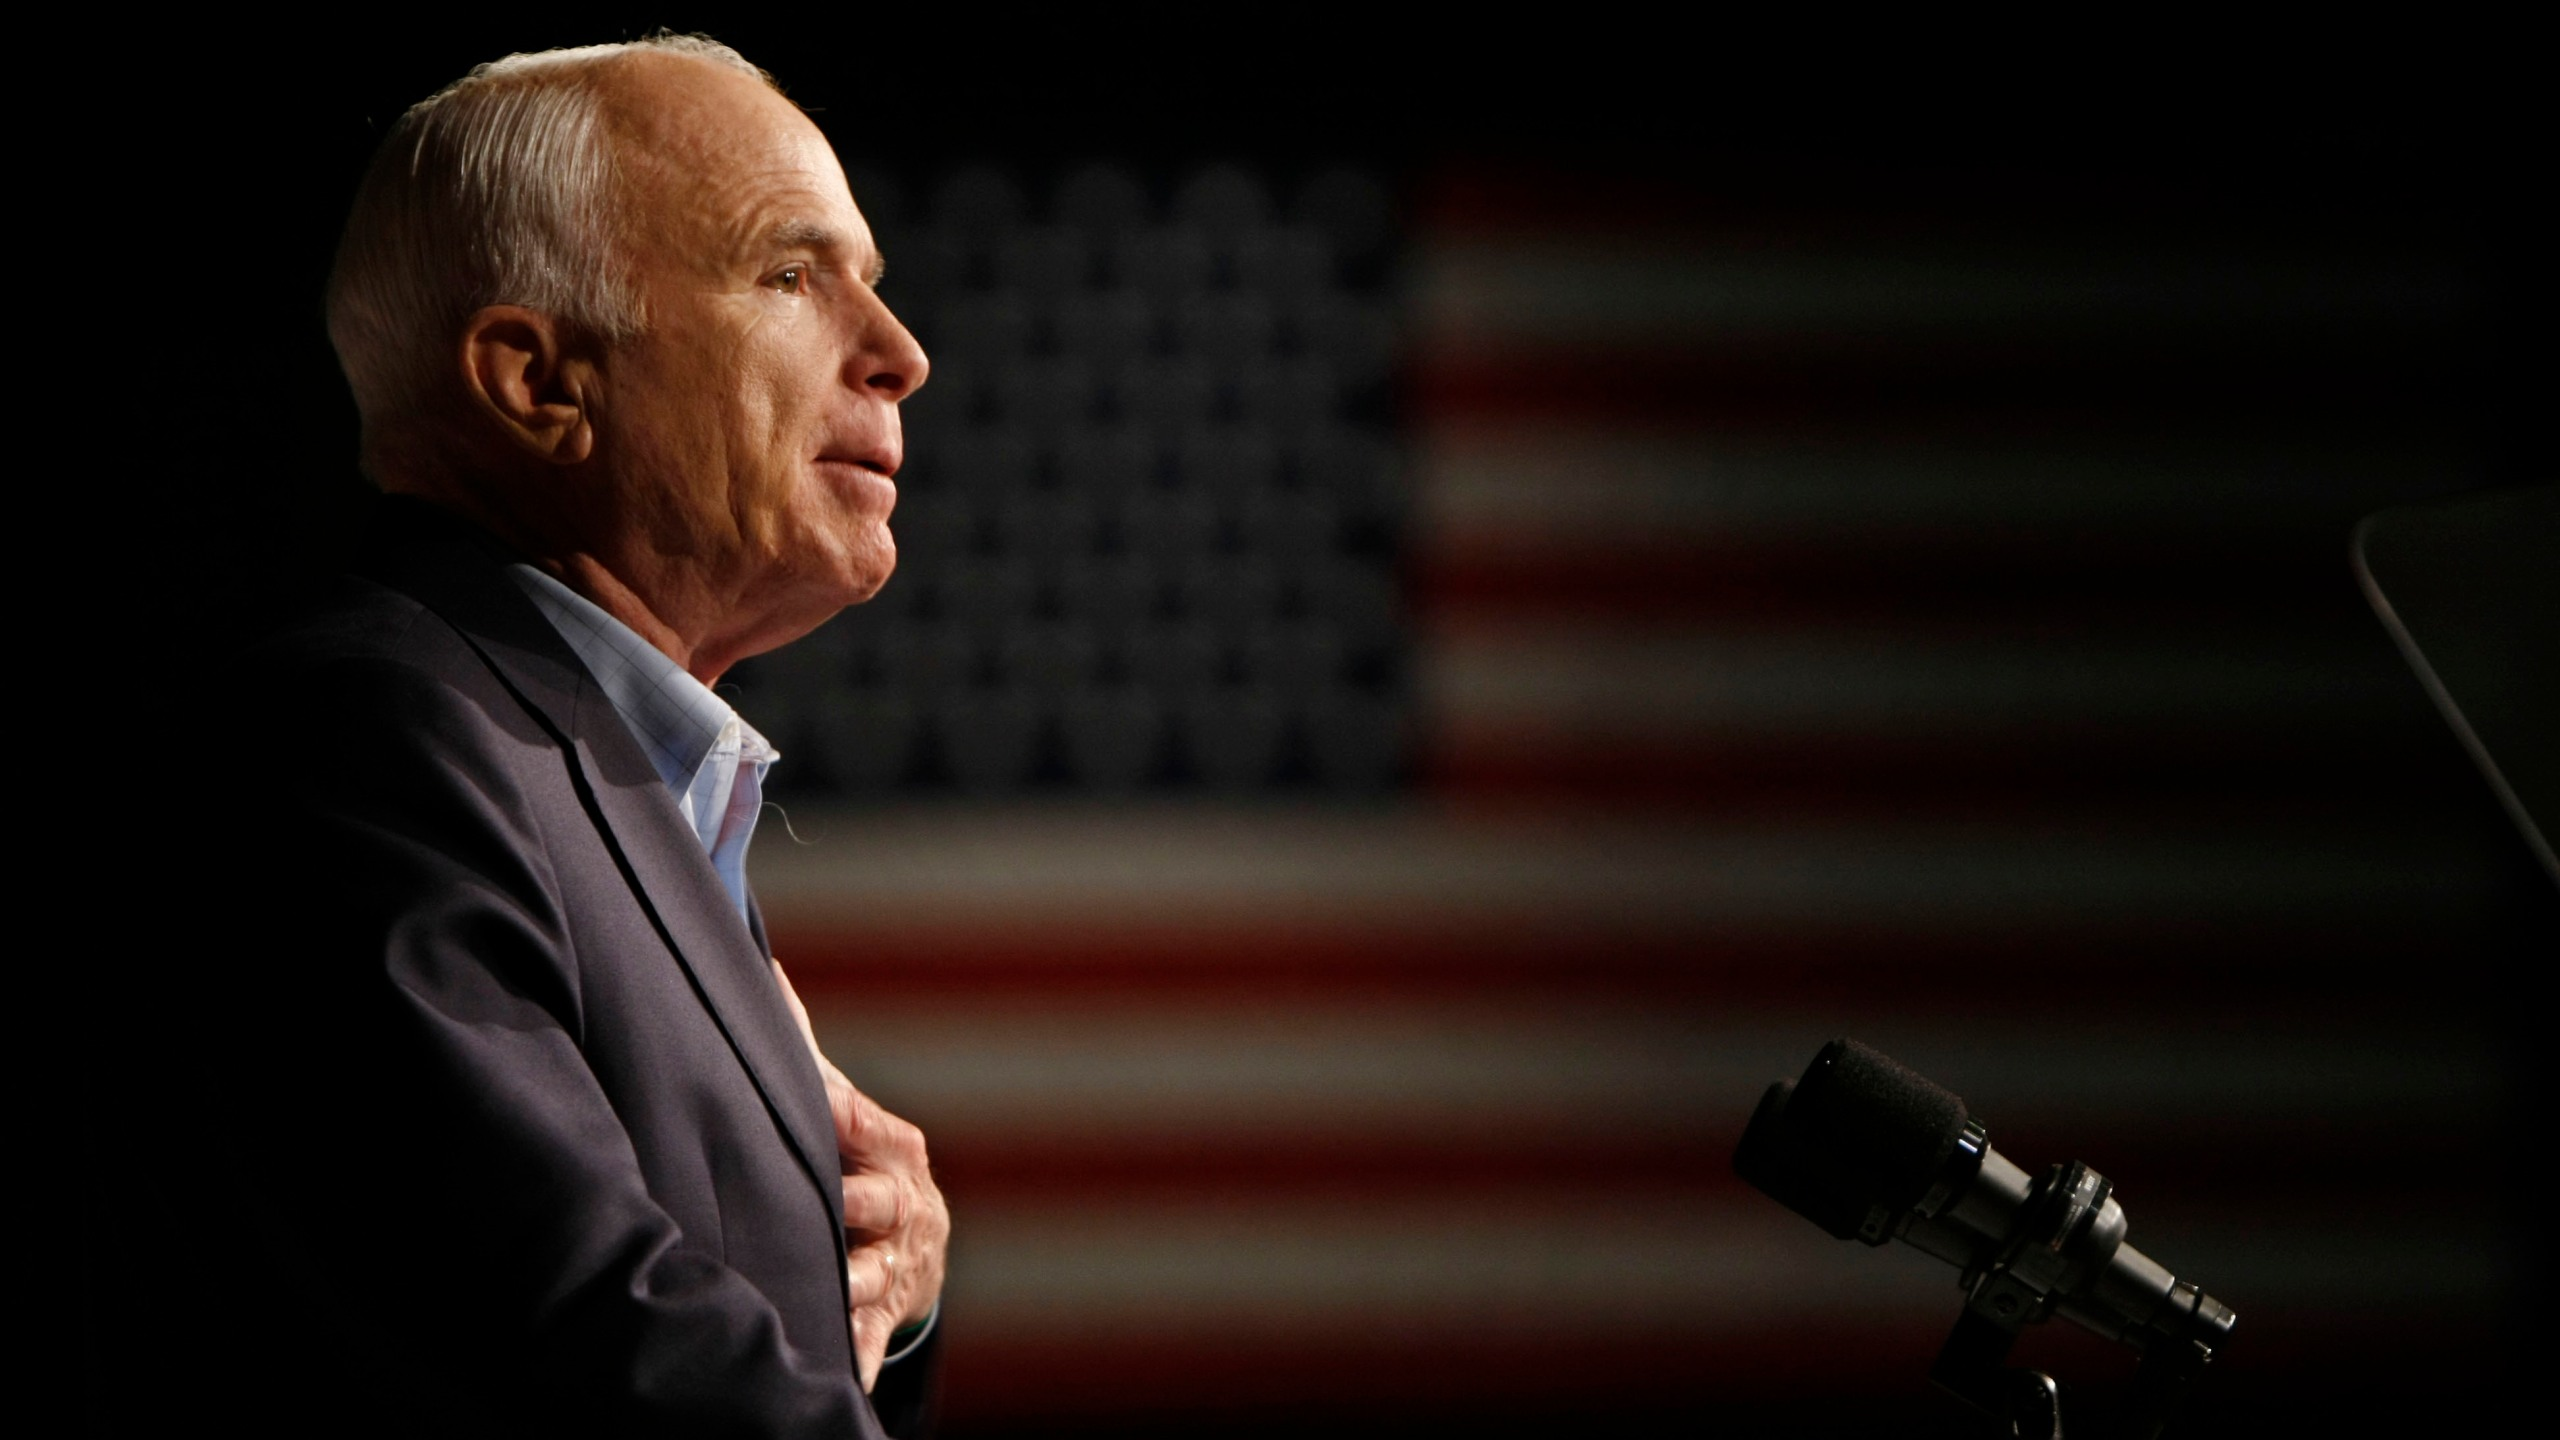 Obit_McCain_58129-159532.jpg25367237